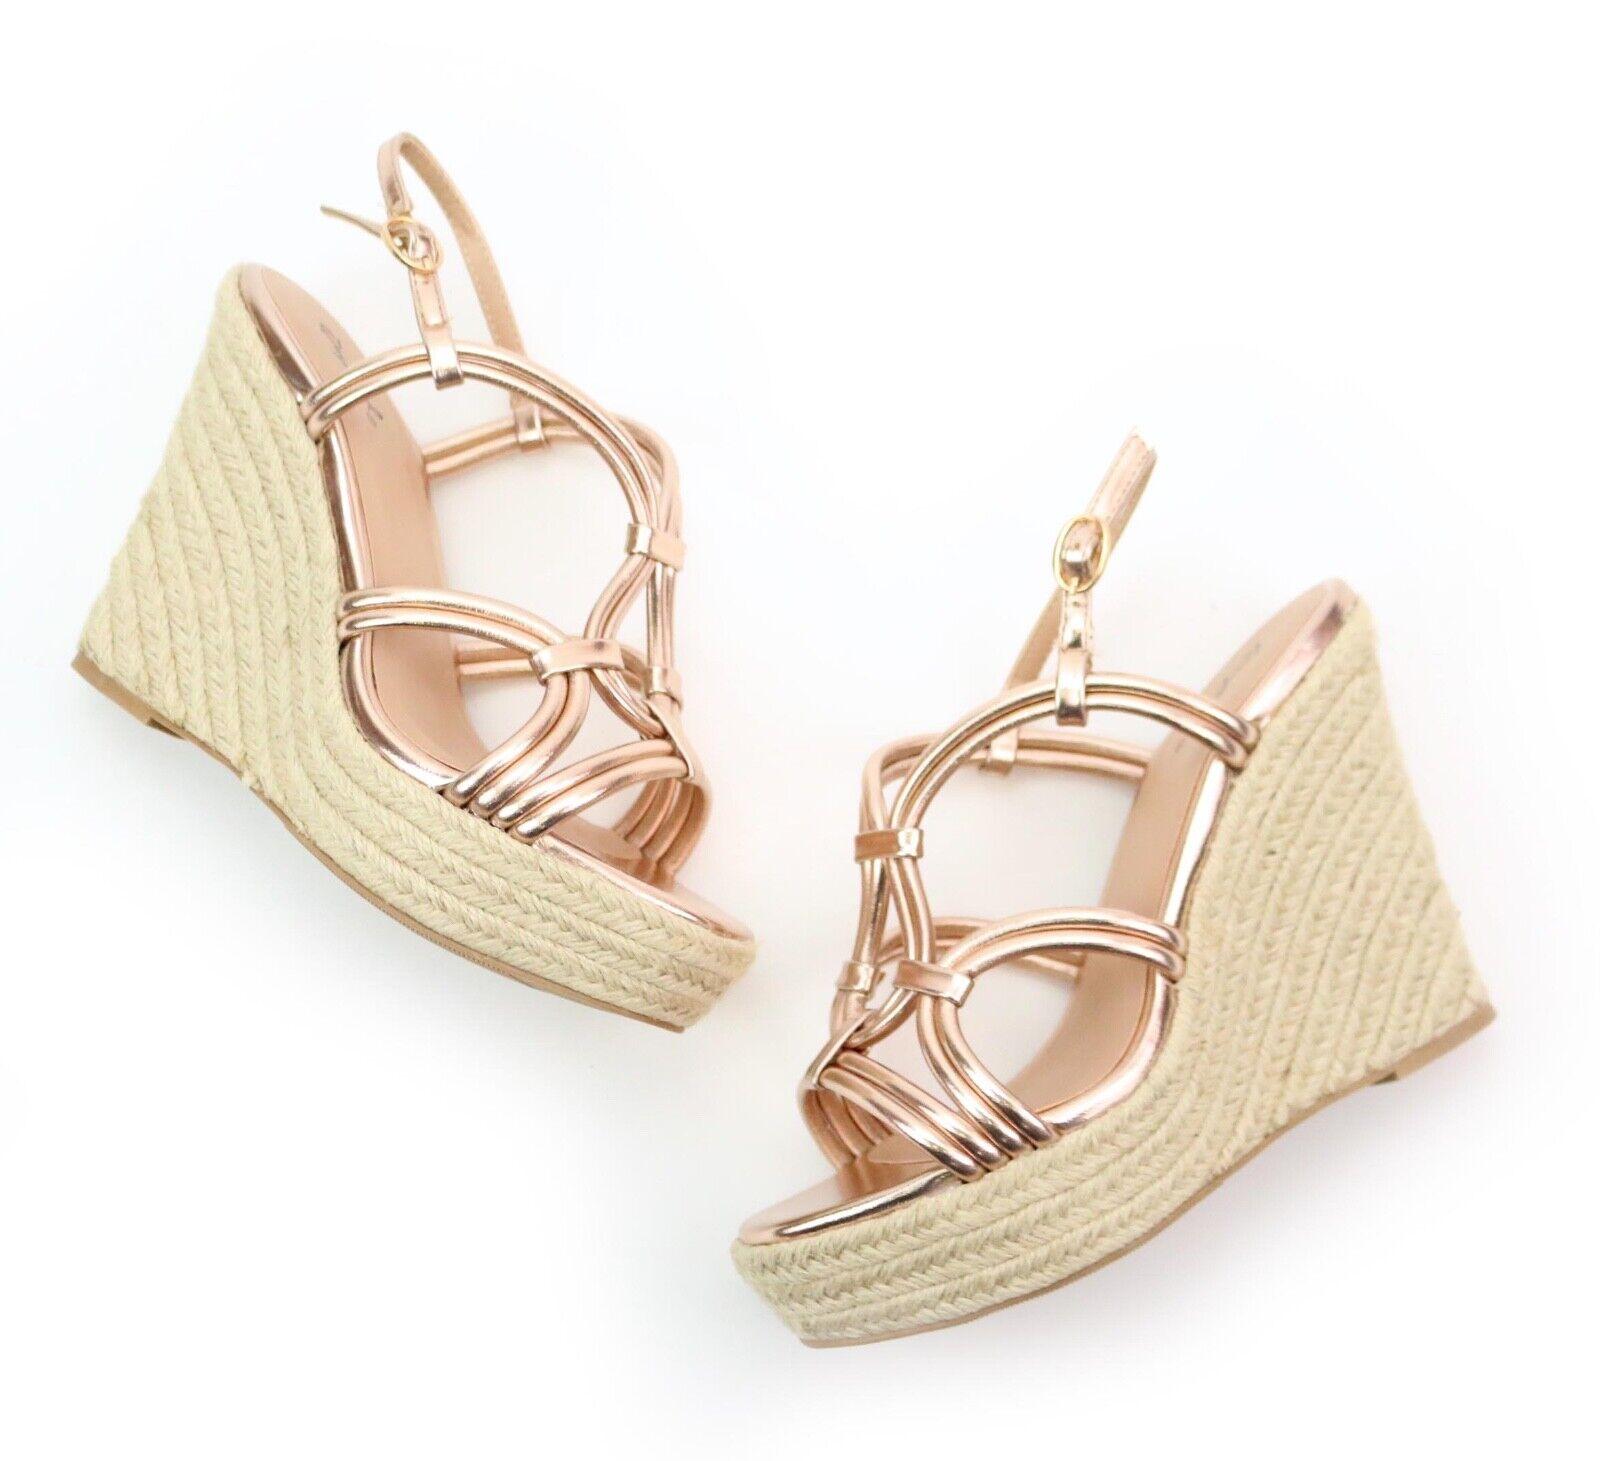 Qupid Kelsey pink gold Metallic Espadrille Wedge Heels Size 7 NEW